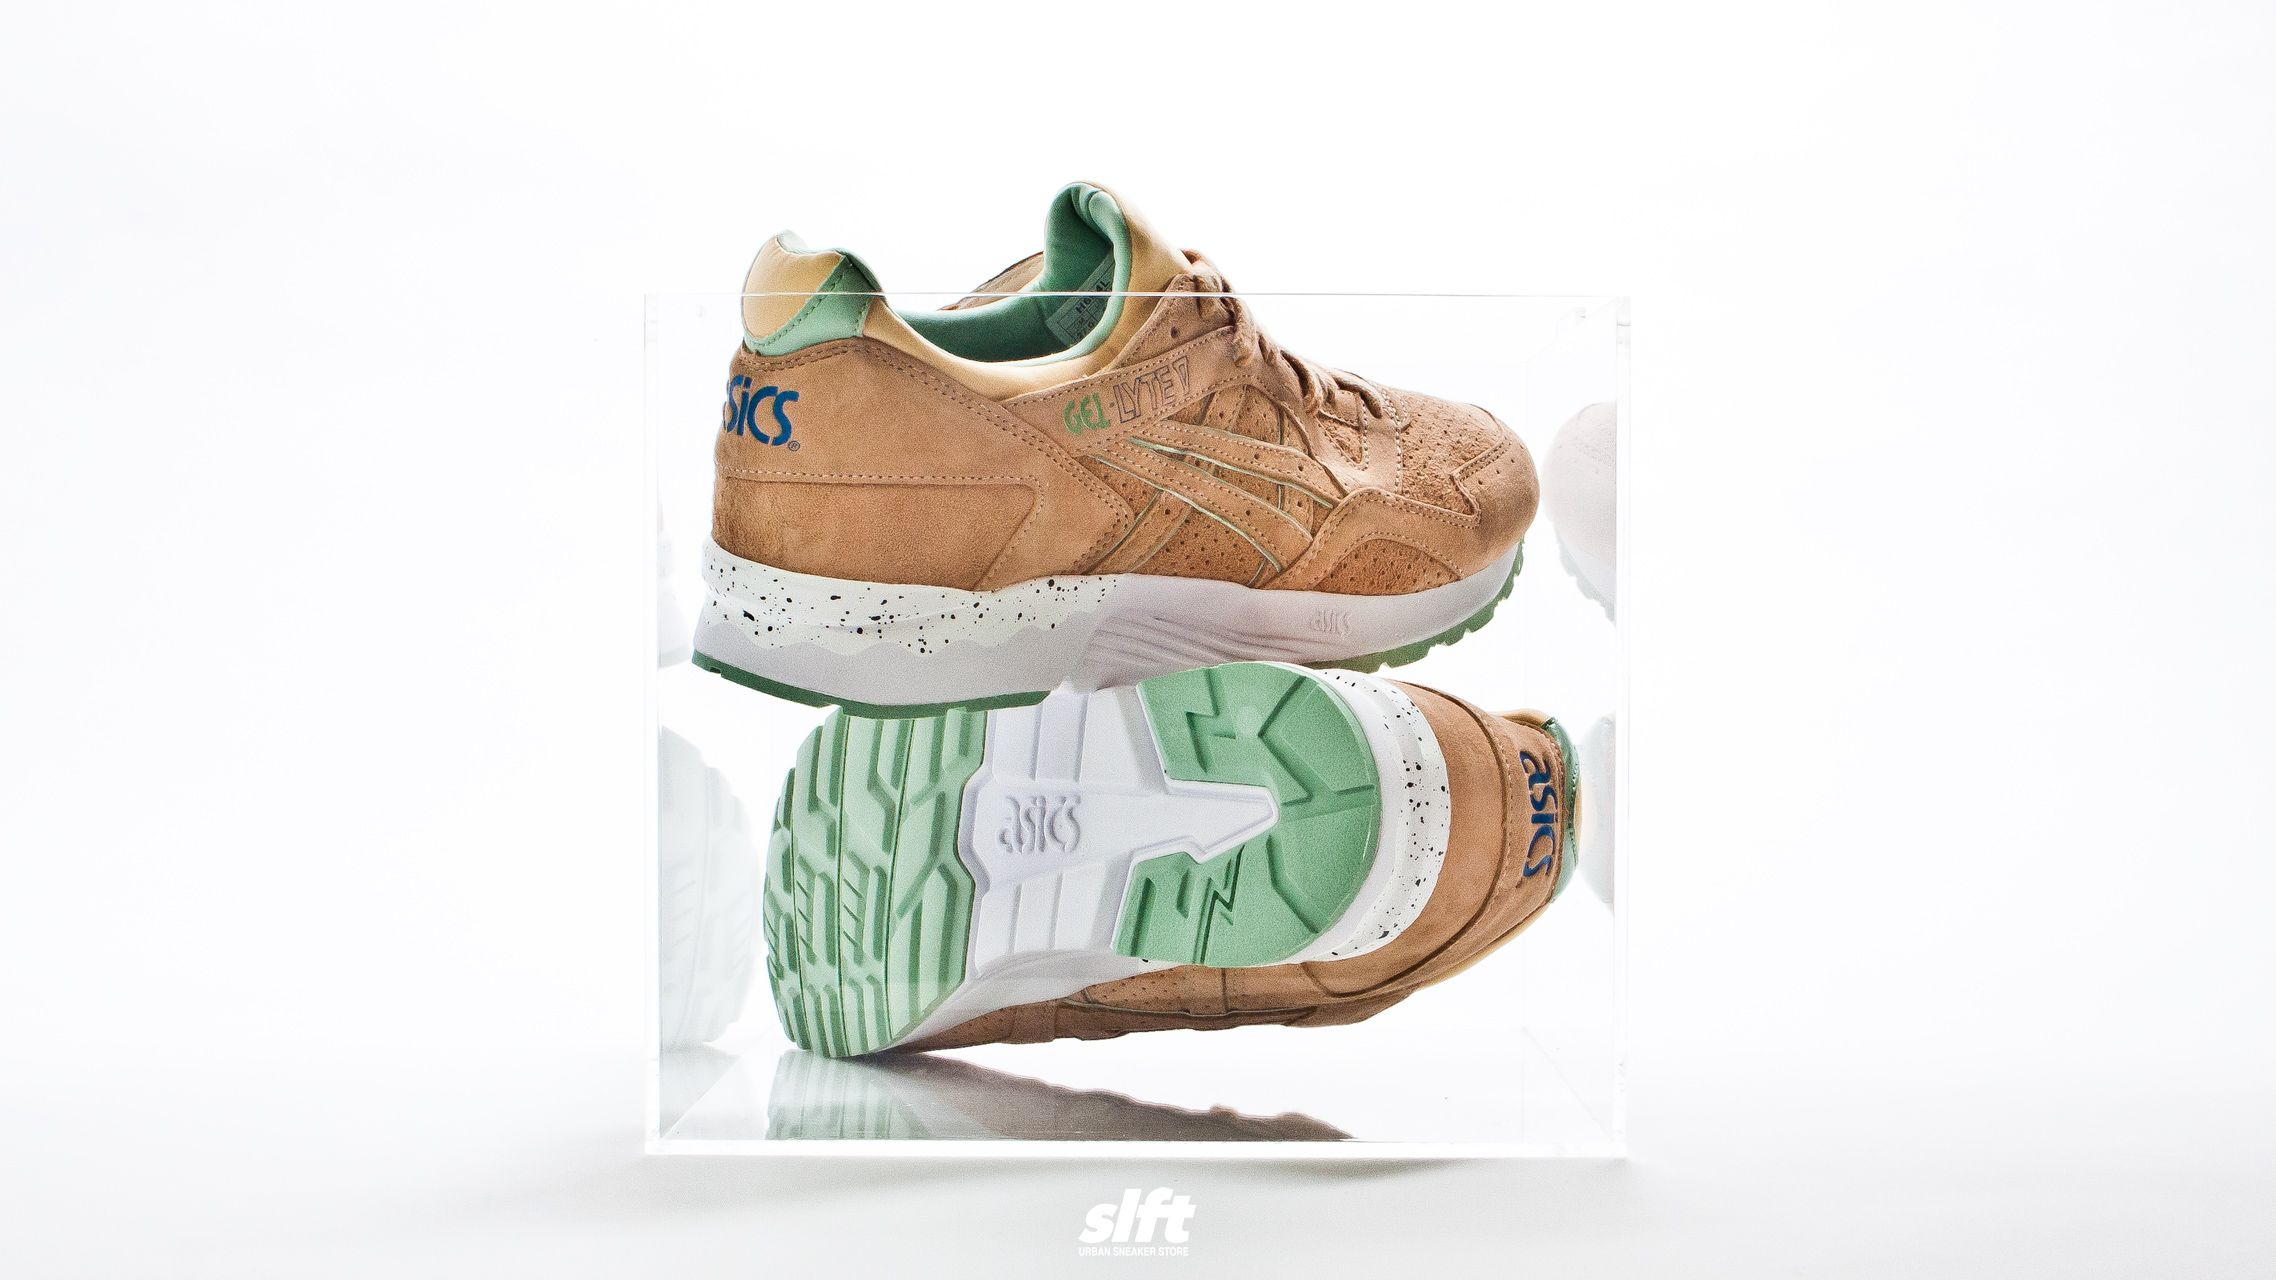 "Der Gel-Lyte V ""Sunburst"" aus dem April Showers Pack von asics, ab dem 01.04.2016 inStore und onLine auf www.soulfoot.de erhältlich!  Sizerun: EU 36,5 - 44  €130  #asics #gellyte #gl5 #aprilshowers #sneaker #soulfoot #slft"